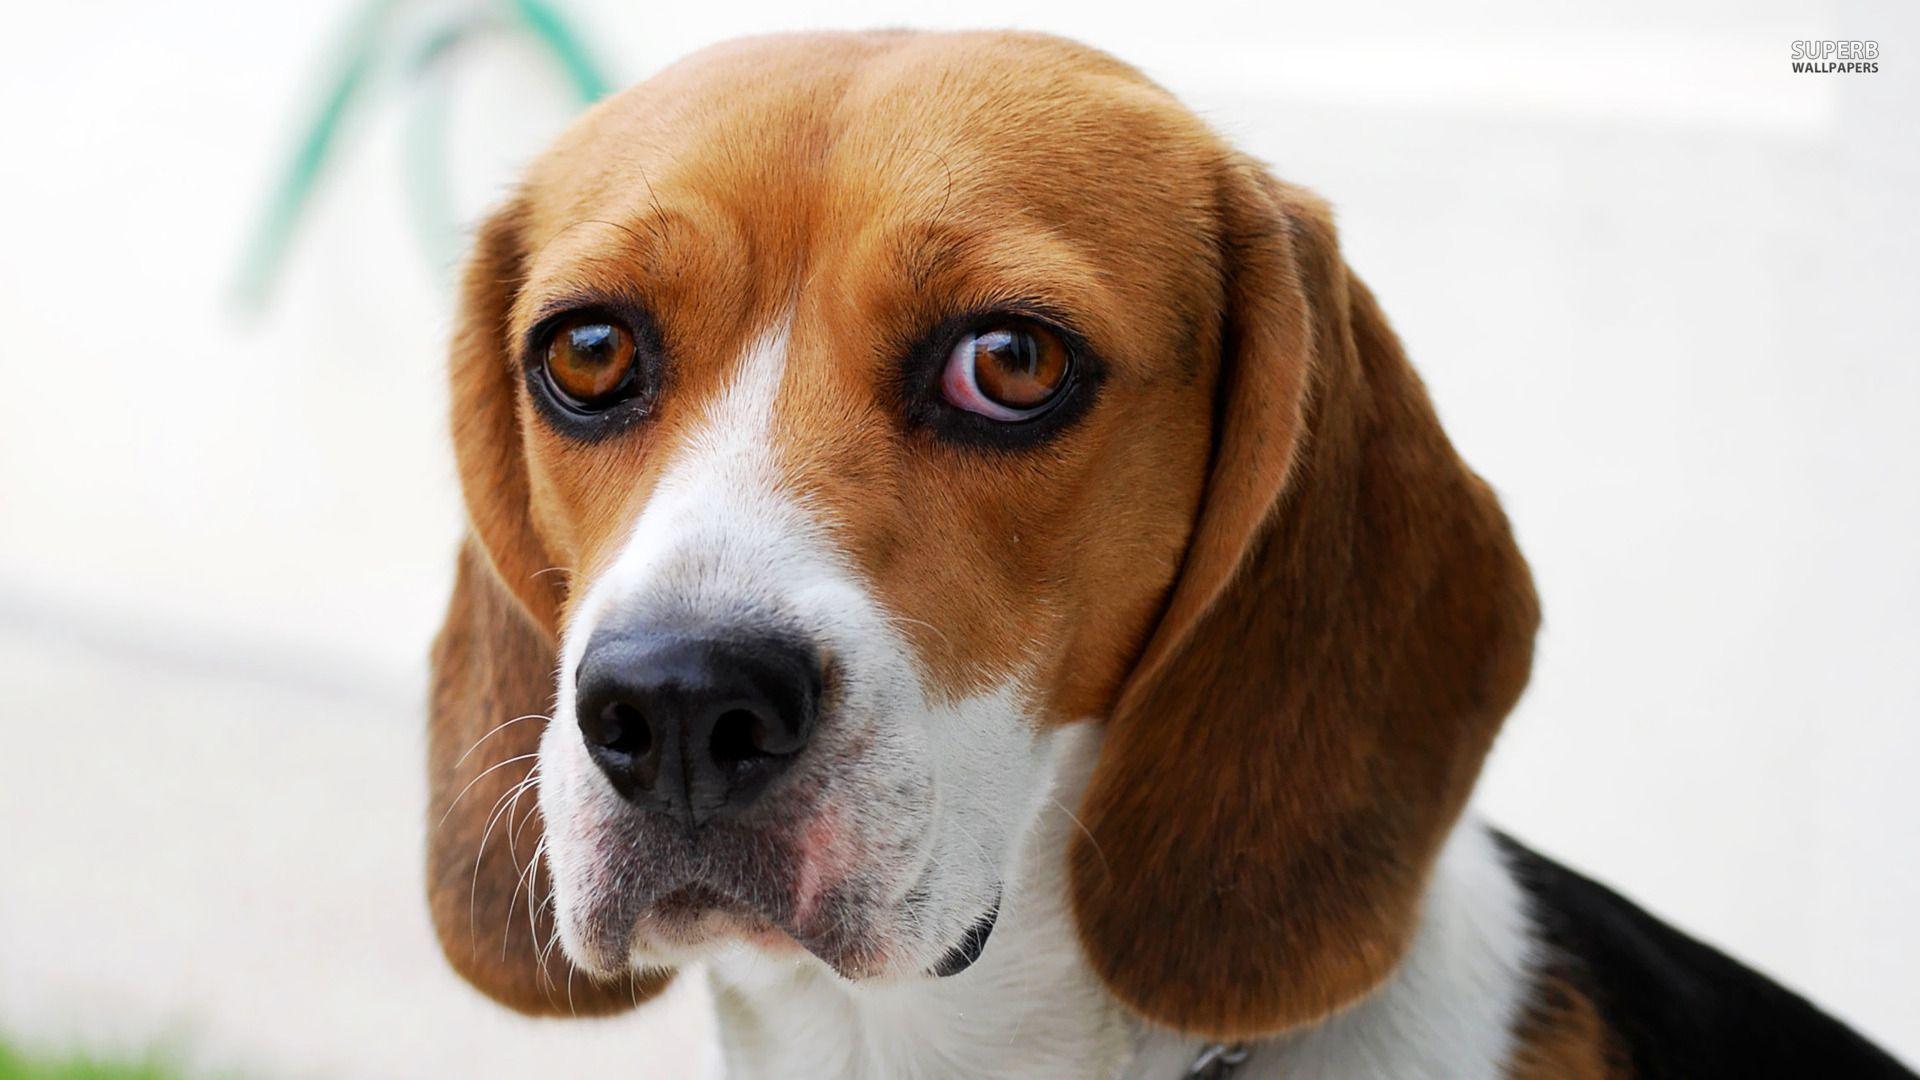 Beagle beagle wallpaper animal wallpapers 17943 i miss my beagle beagle wallpaper animal wallpapers 17943 voltagebd Images